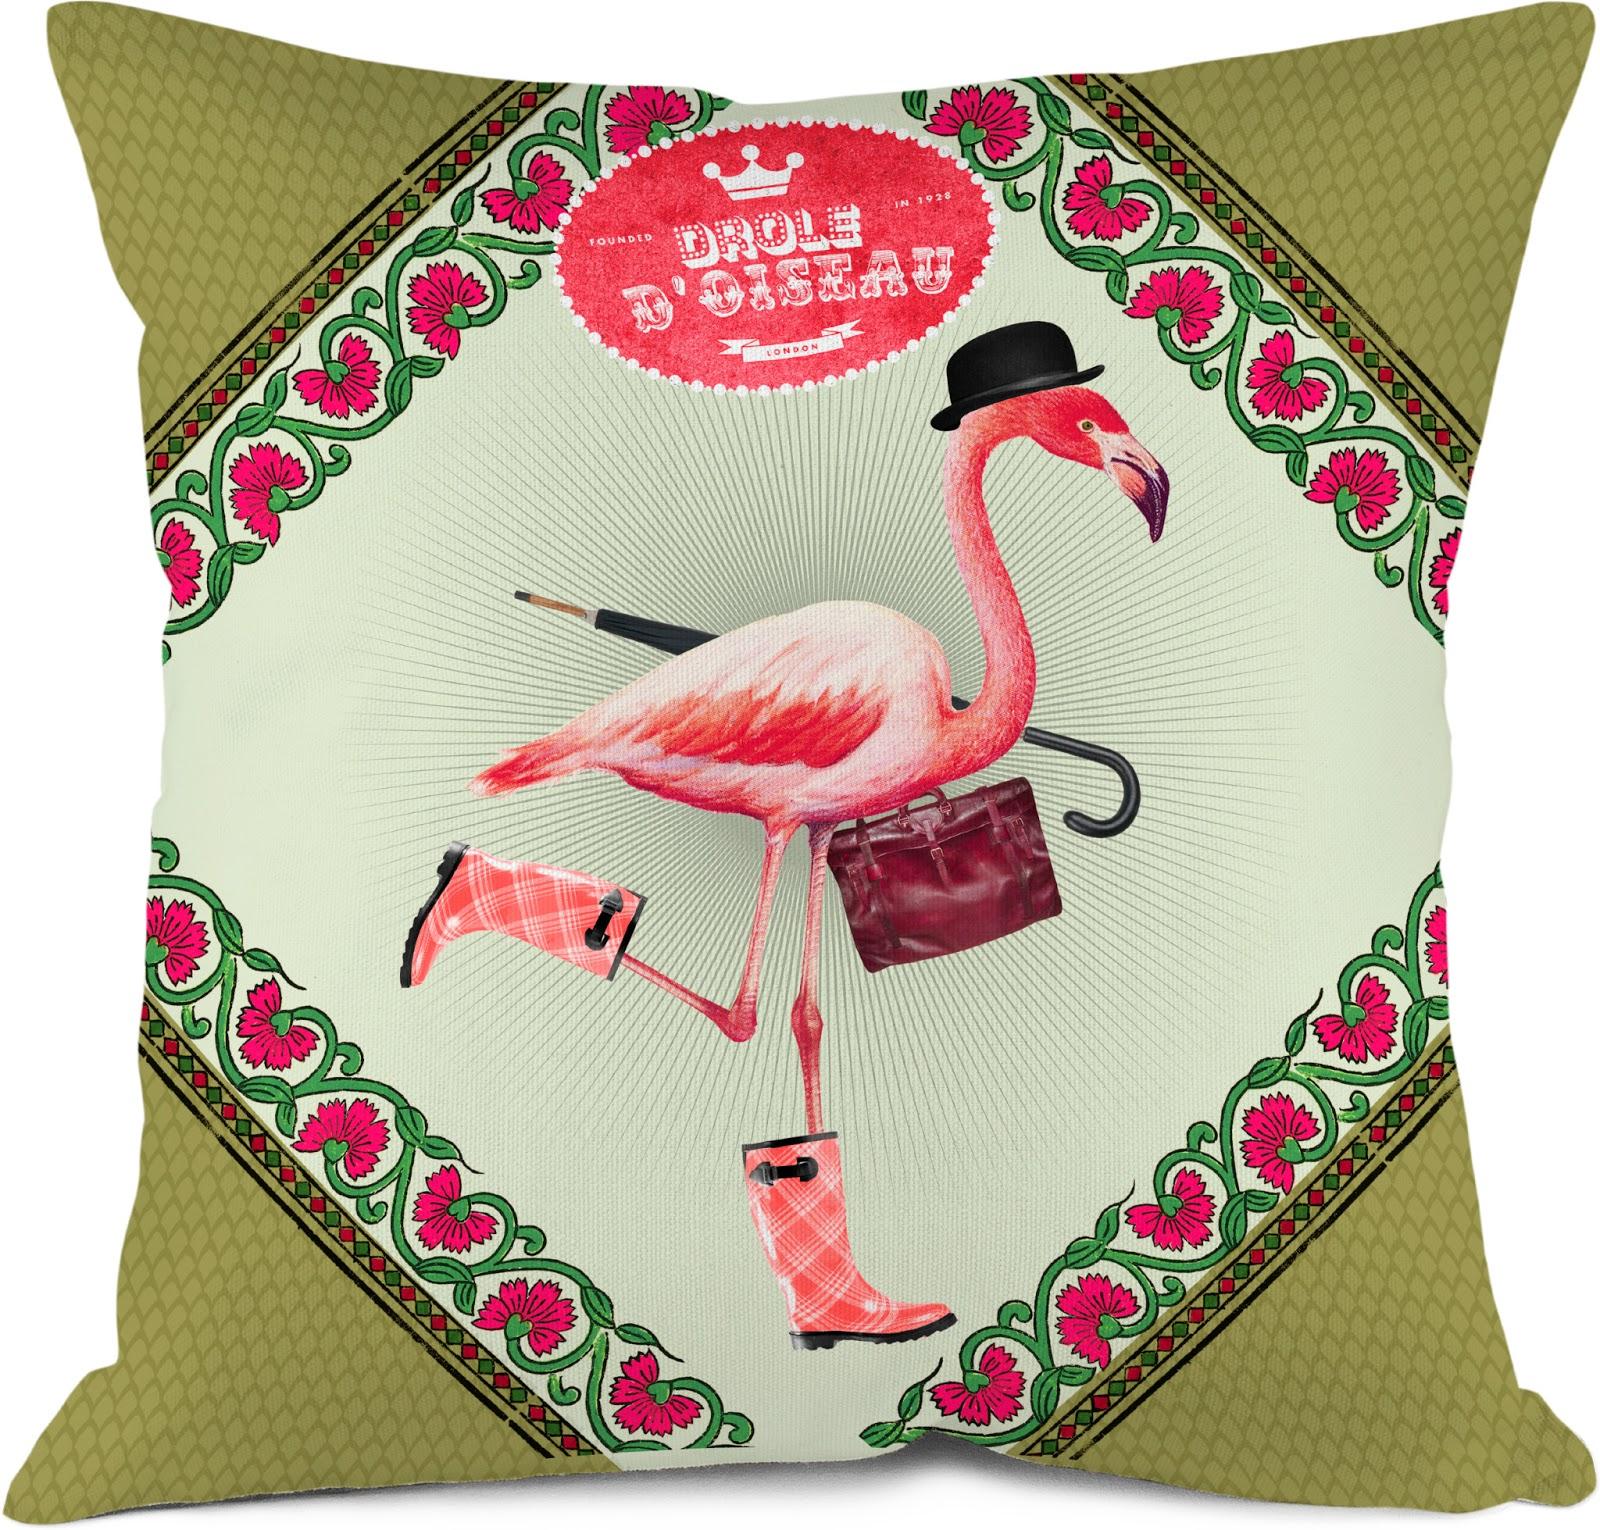 Urbinsthings lifestyle cadeaus, gadgets  u0026 woonaccessoires  Go Flamingo